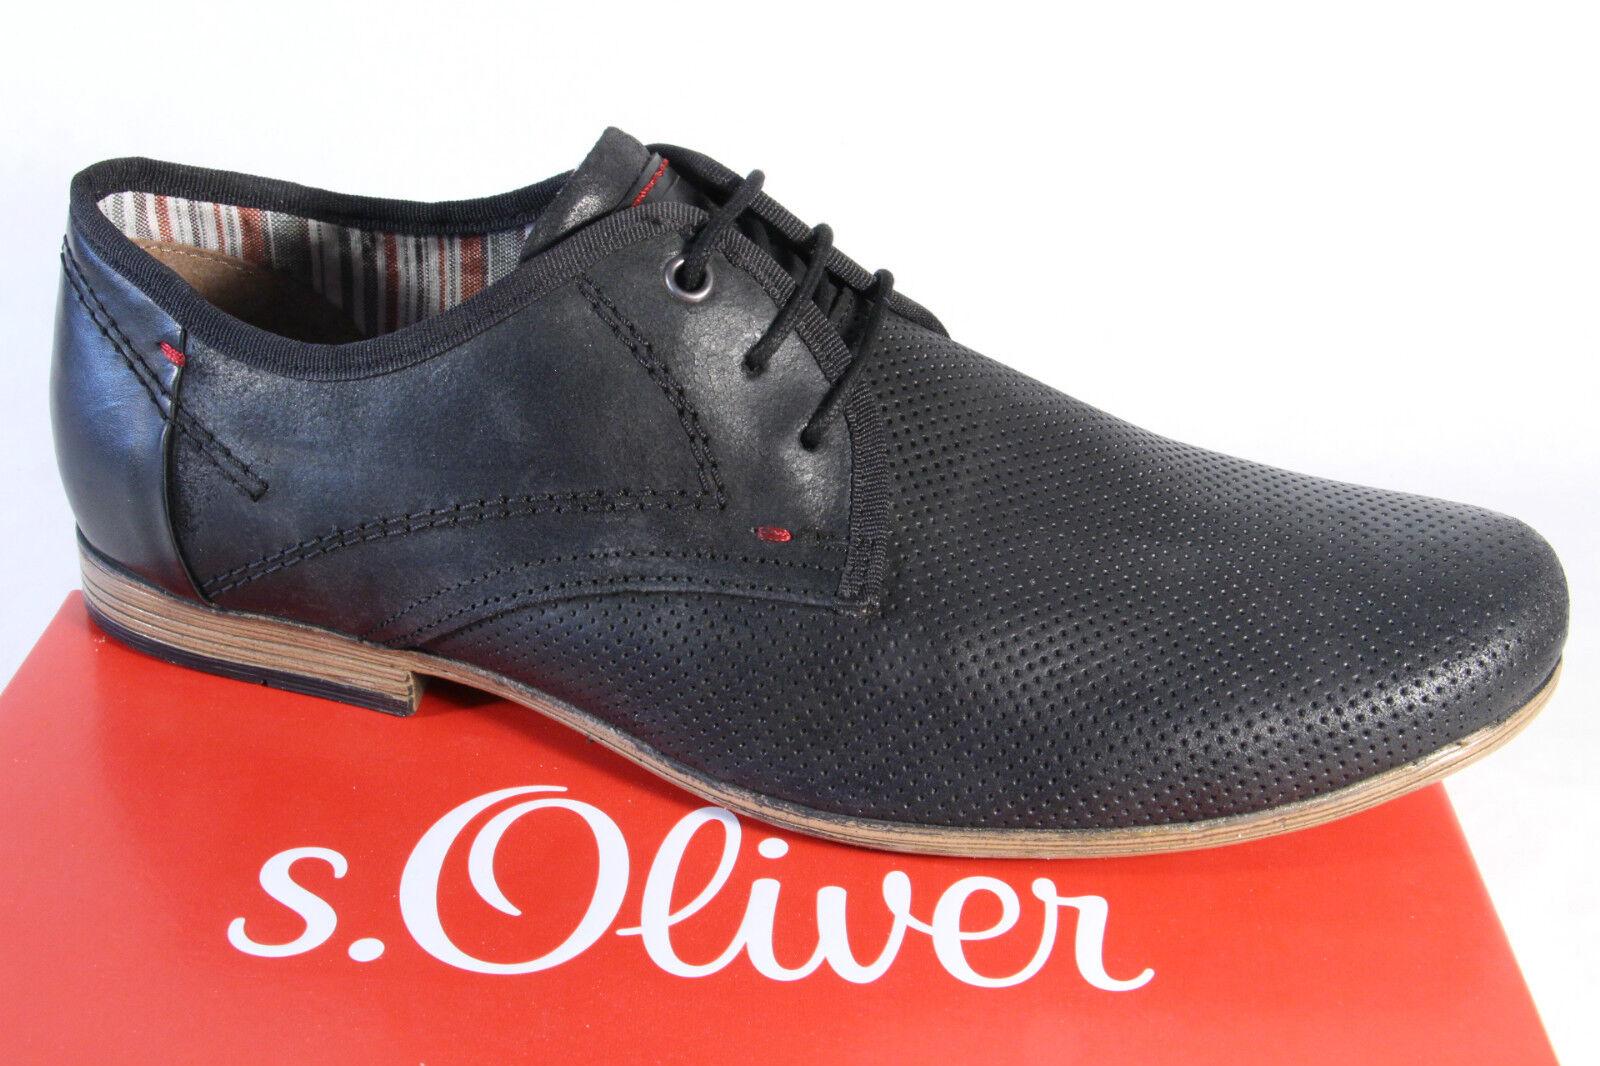 S.Oliver Herren Schnürschuhe, Halbschuhe, Sneakers schwarz Leder  NEU!!